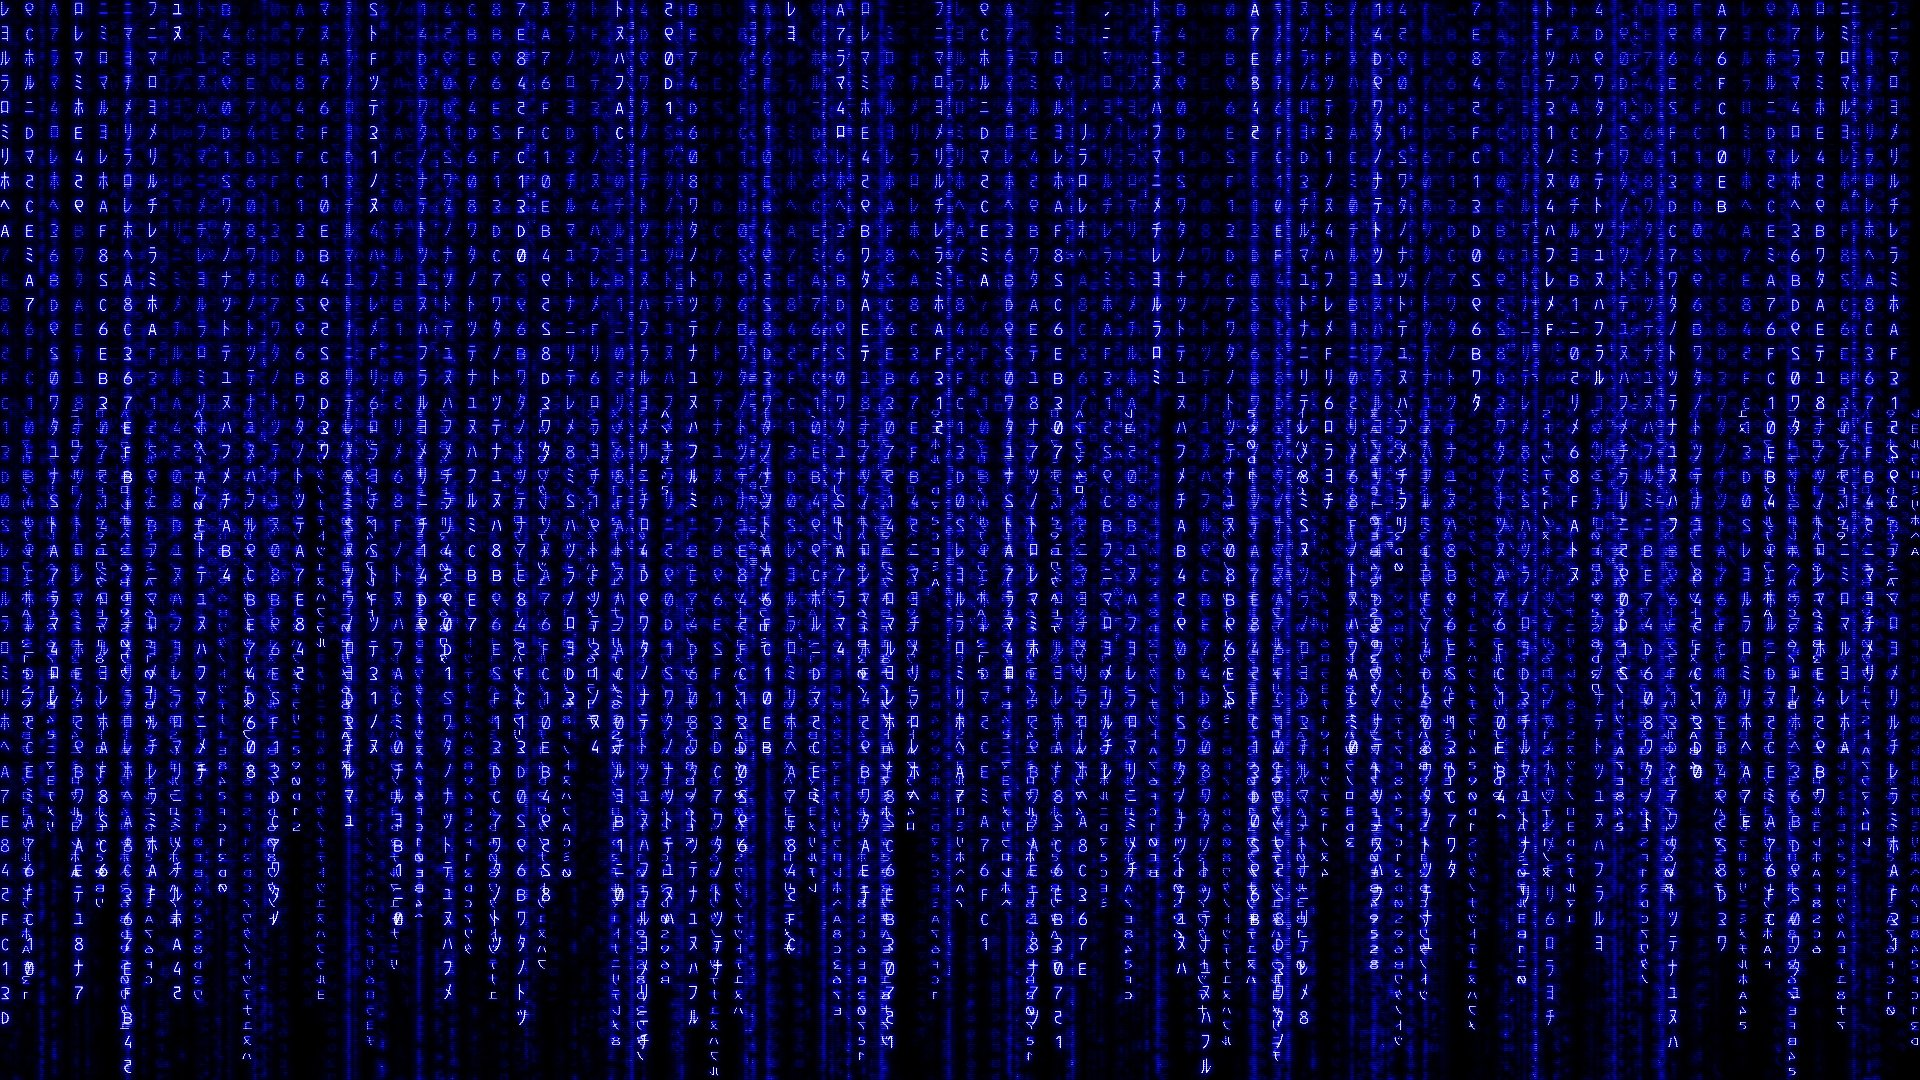 Matrix Wallpaper For Pc